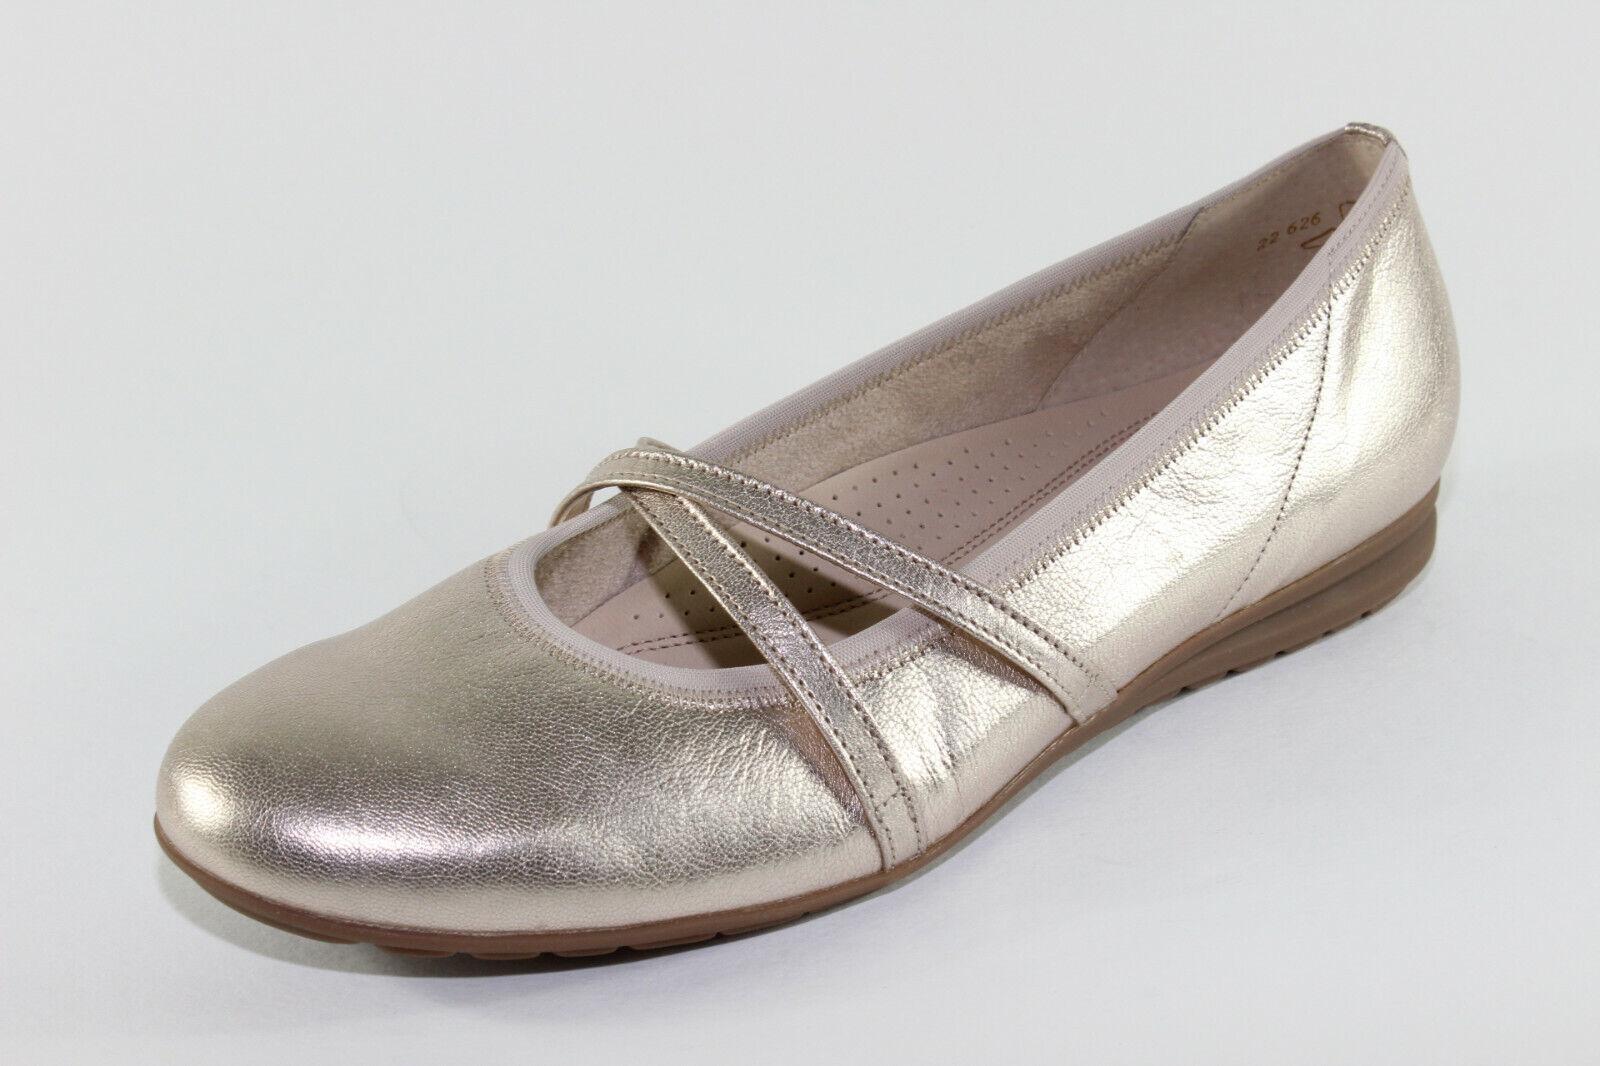 mit Ballerinas komfortable Gabor Effekt Leder, 626.89